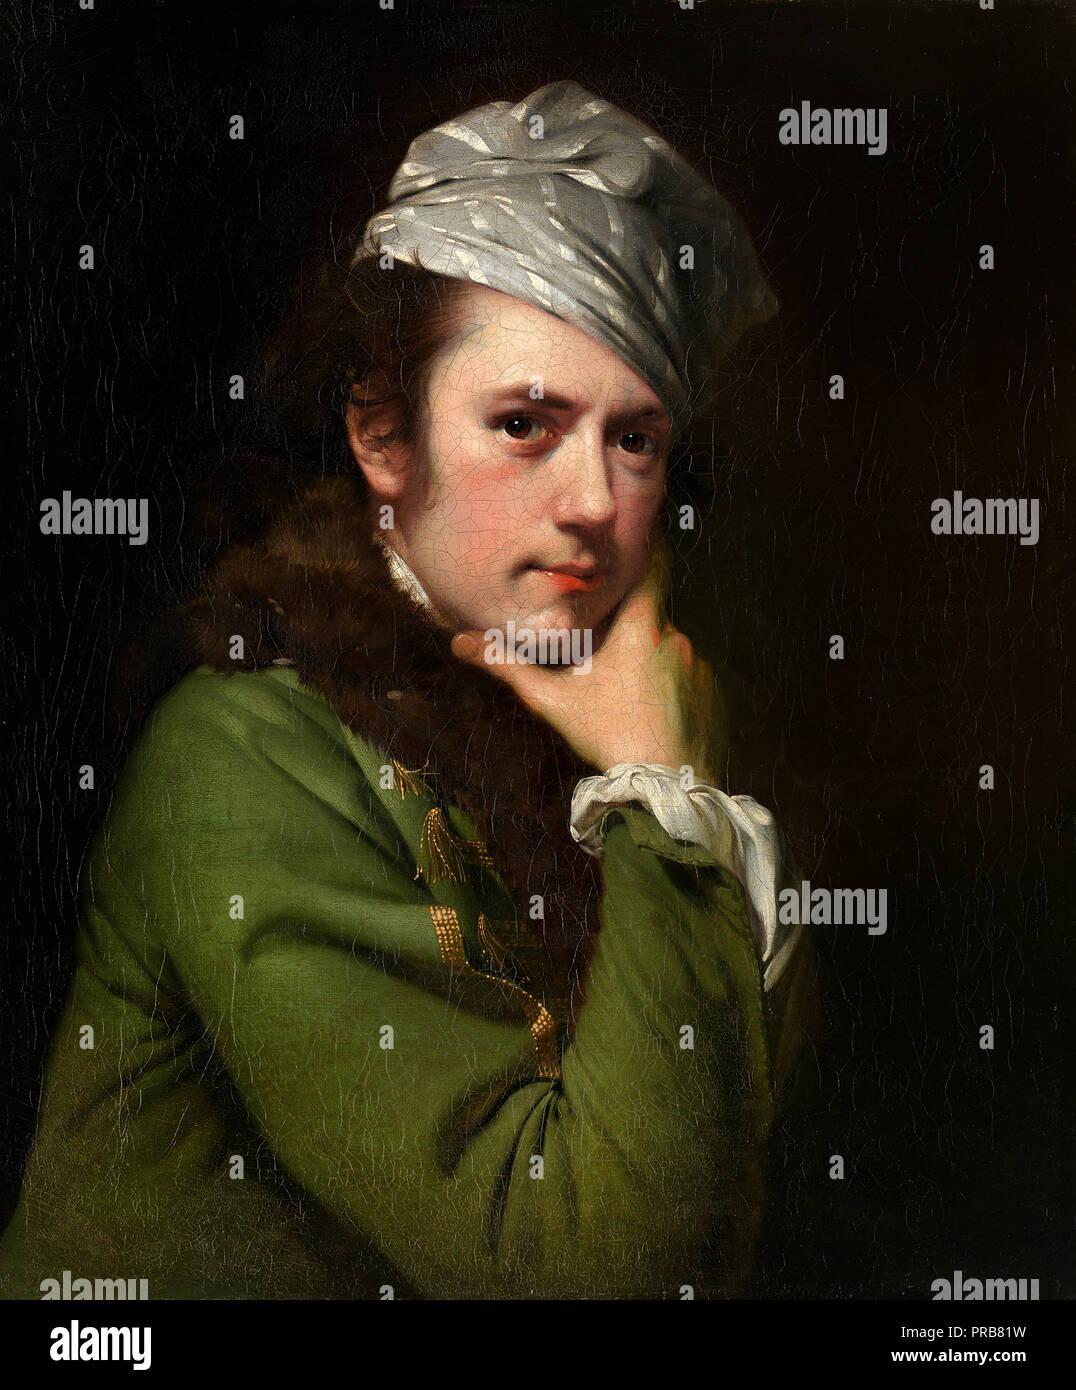 Joseph Wright, Self-portrait 1765-1768 Oil on canvas, National Gallery of Victoria, Australia. - Stock Image